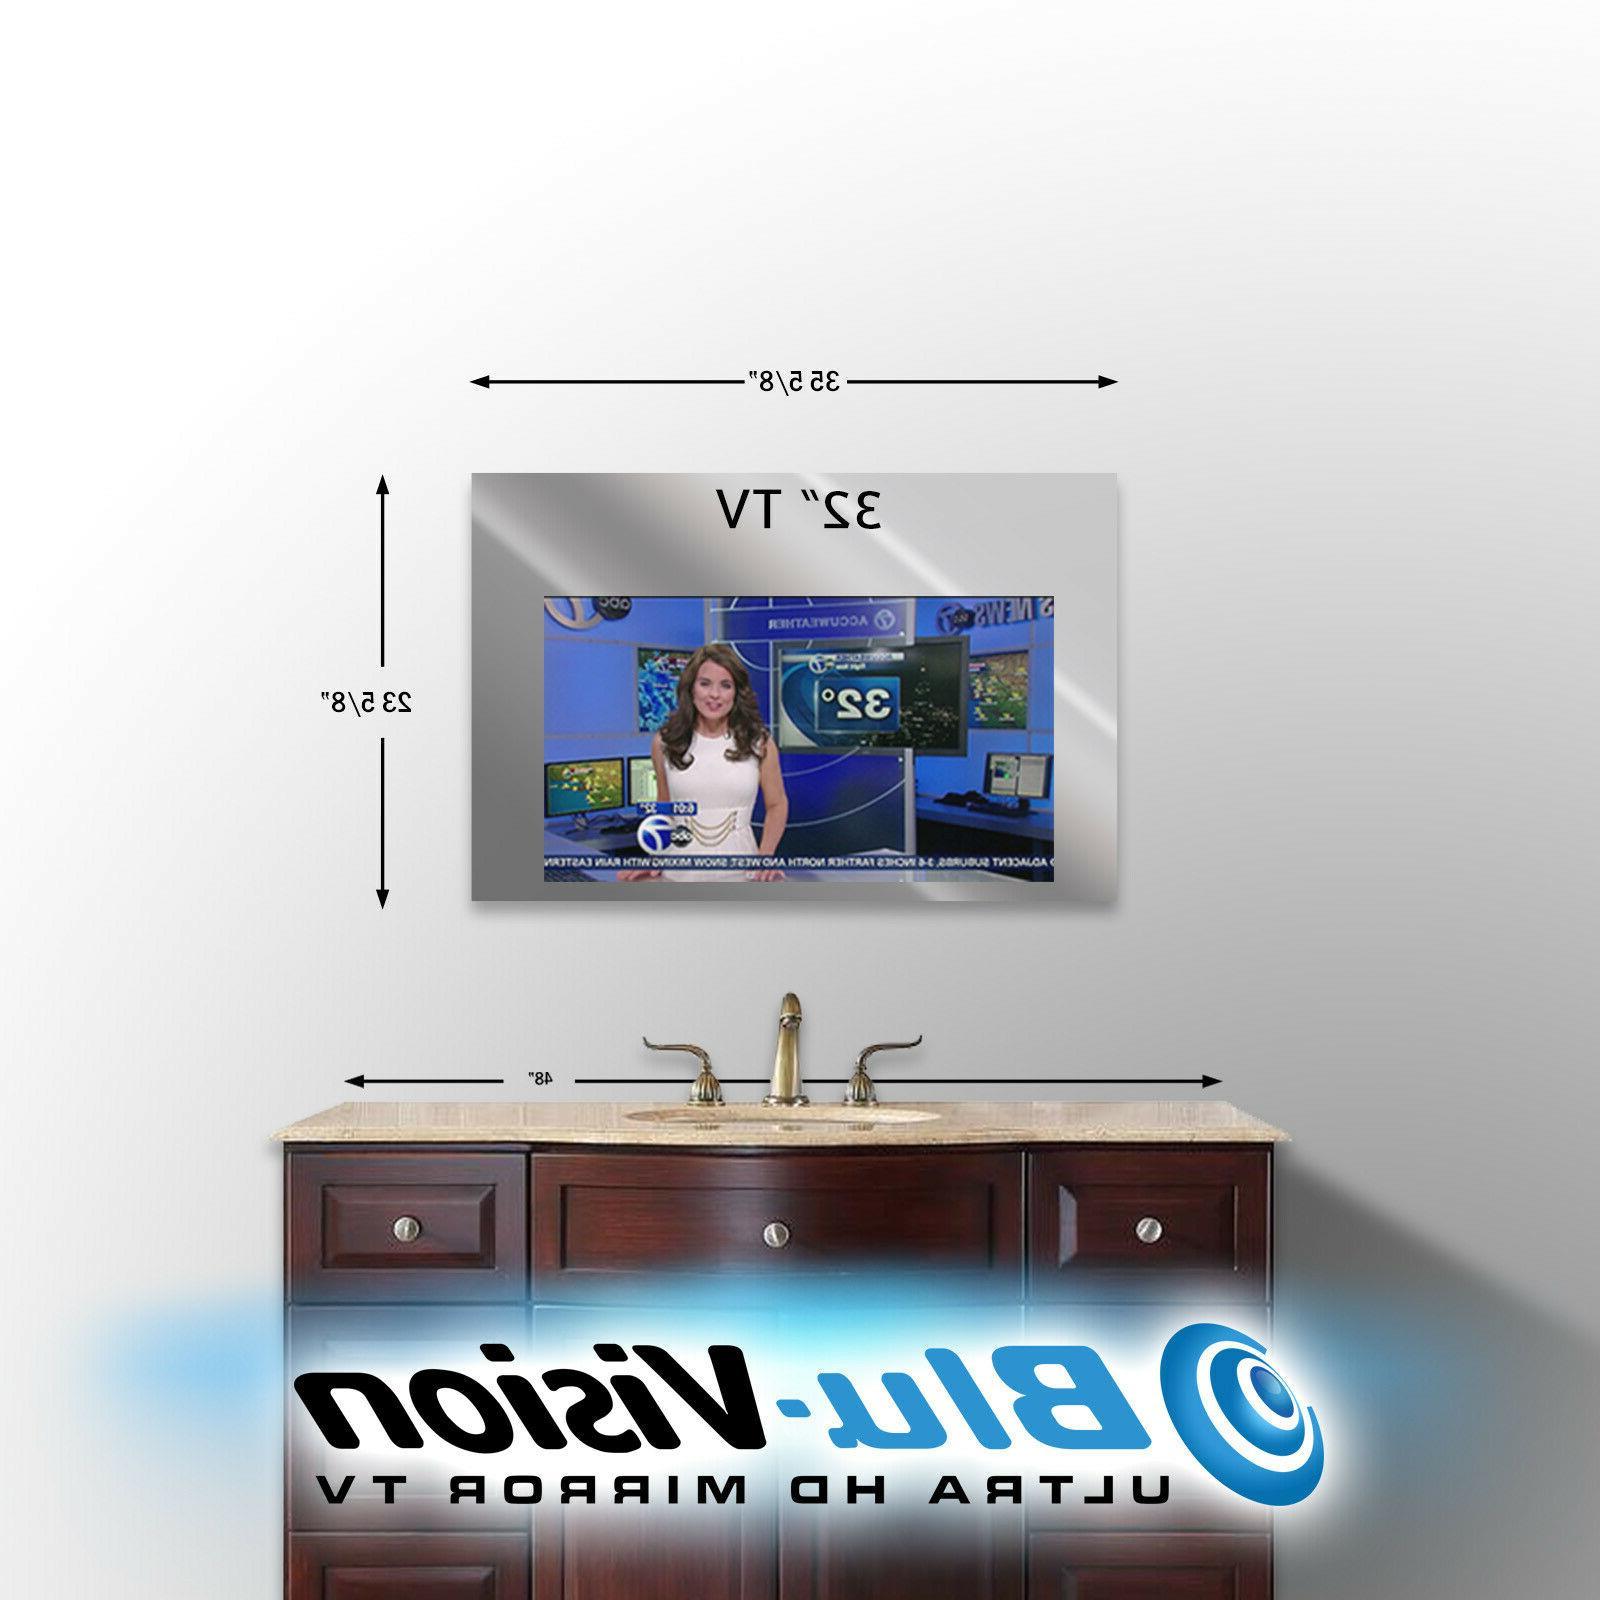 vanity mirror tv 28 led 720p tv